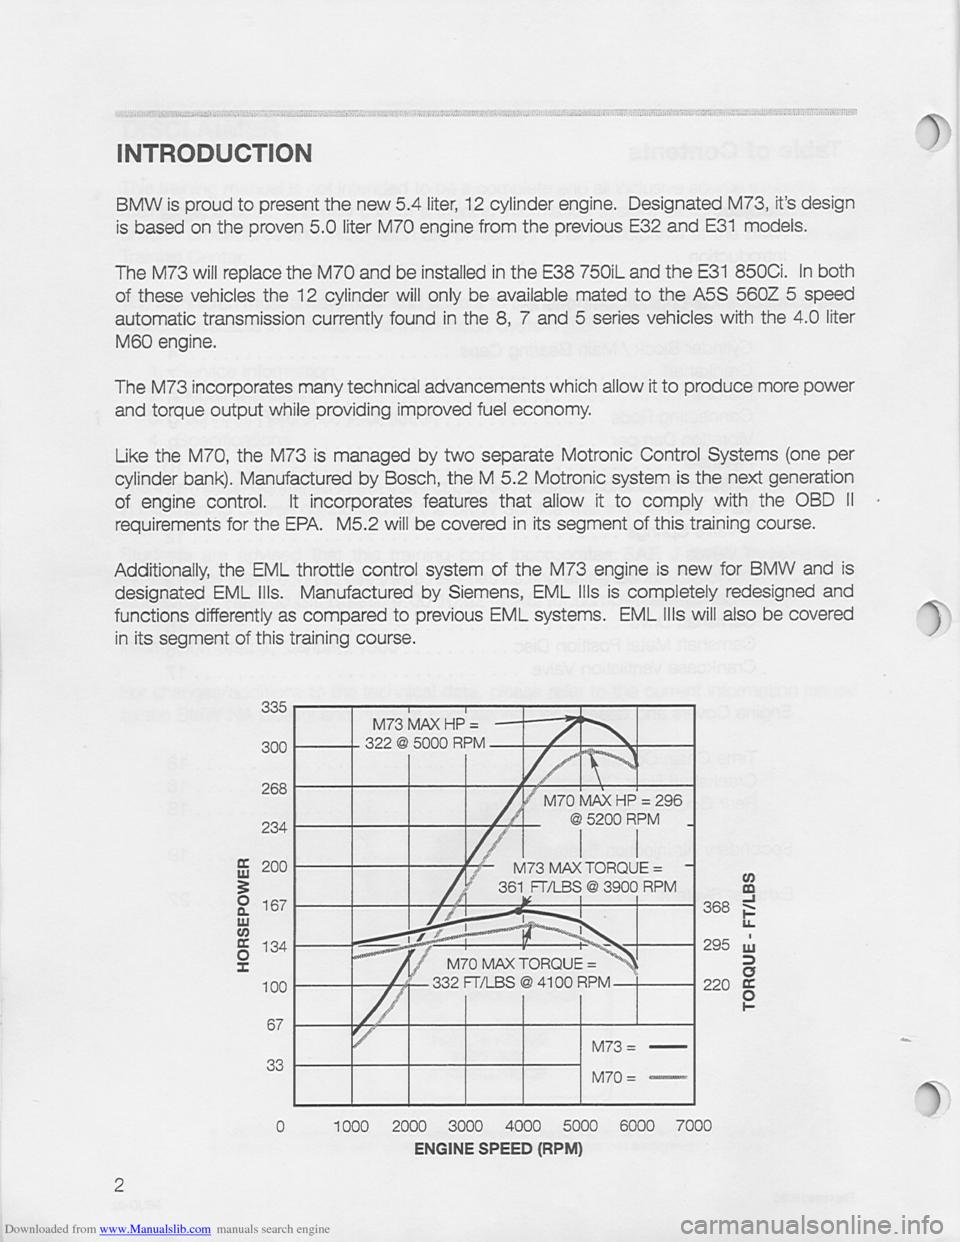 Bmw 850i 1994 E31 M73 Training Reference Manual 850 Engine Diagram